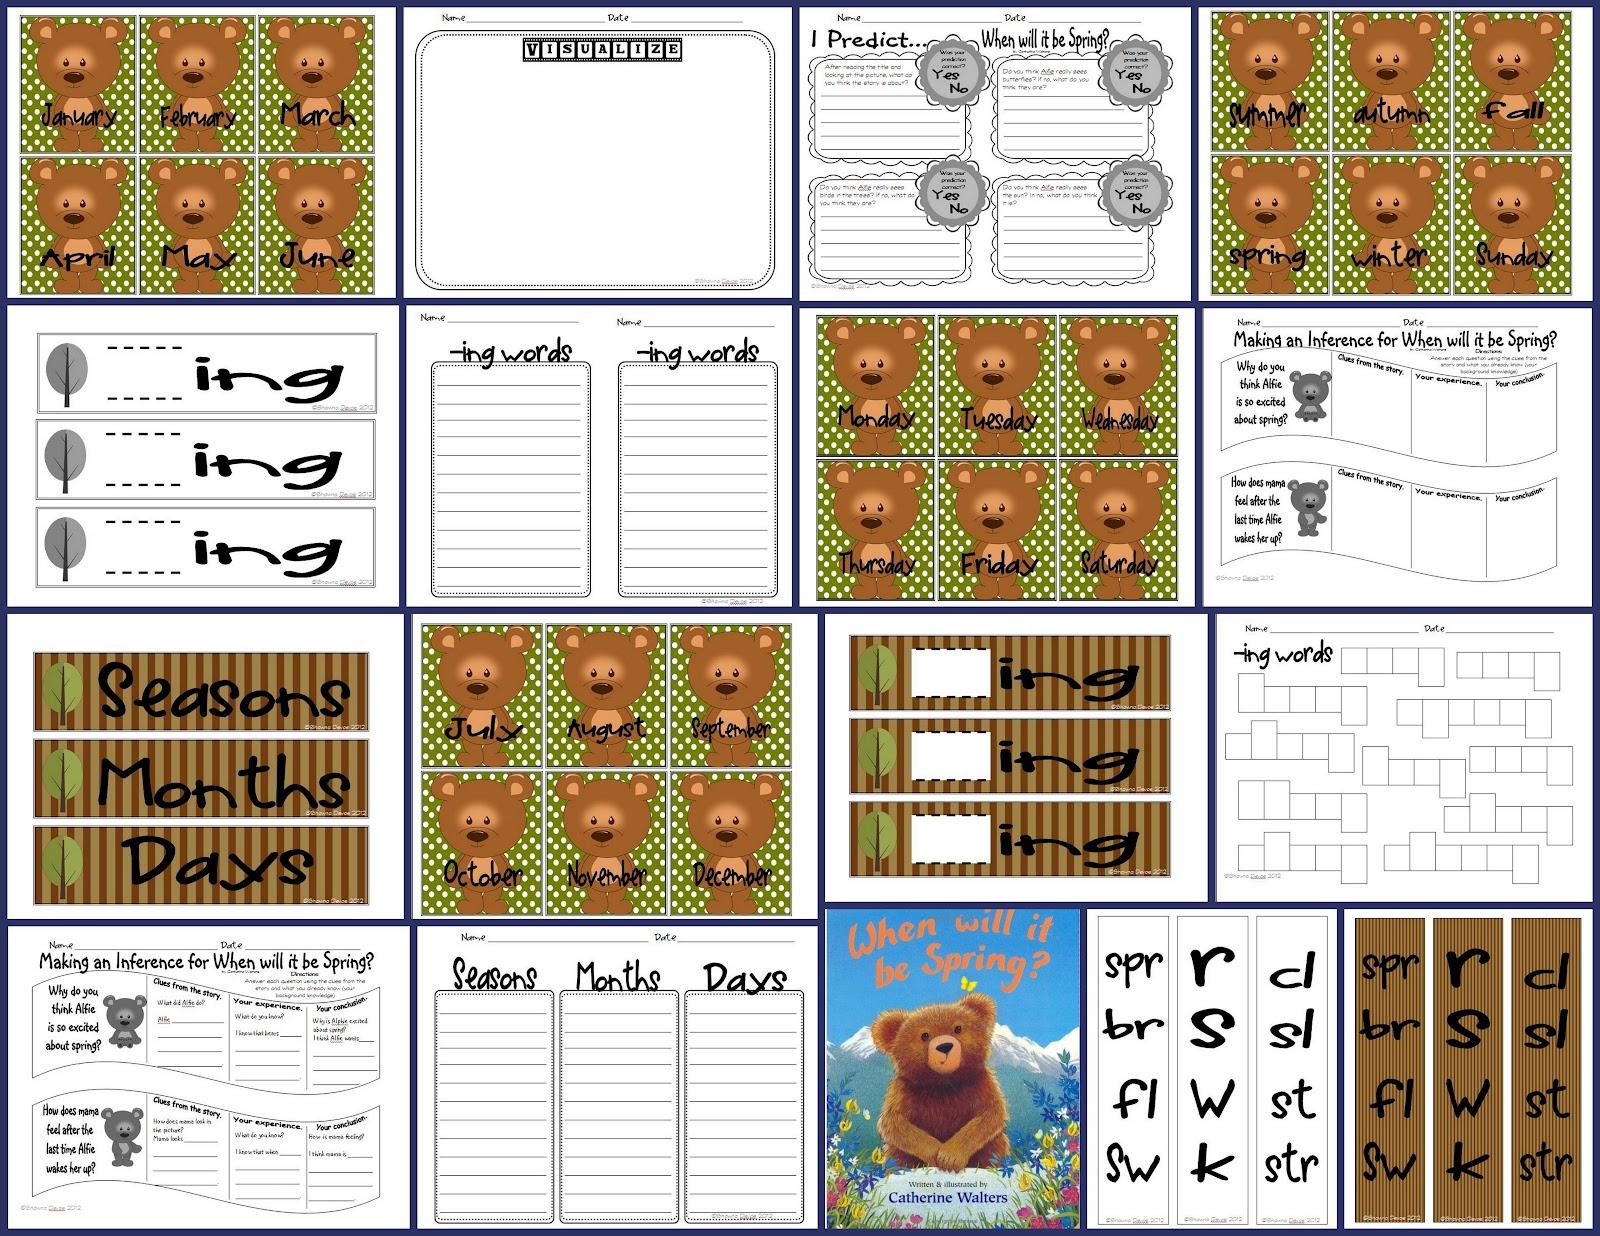 My Froggy Stuff Printables Wallpaper - Wallpapersafari | My Froggy Stuff Printables Worksheets